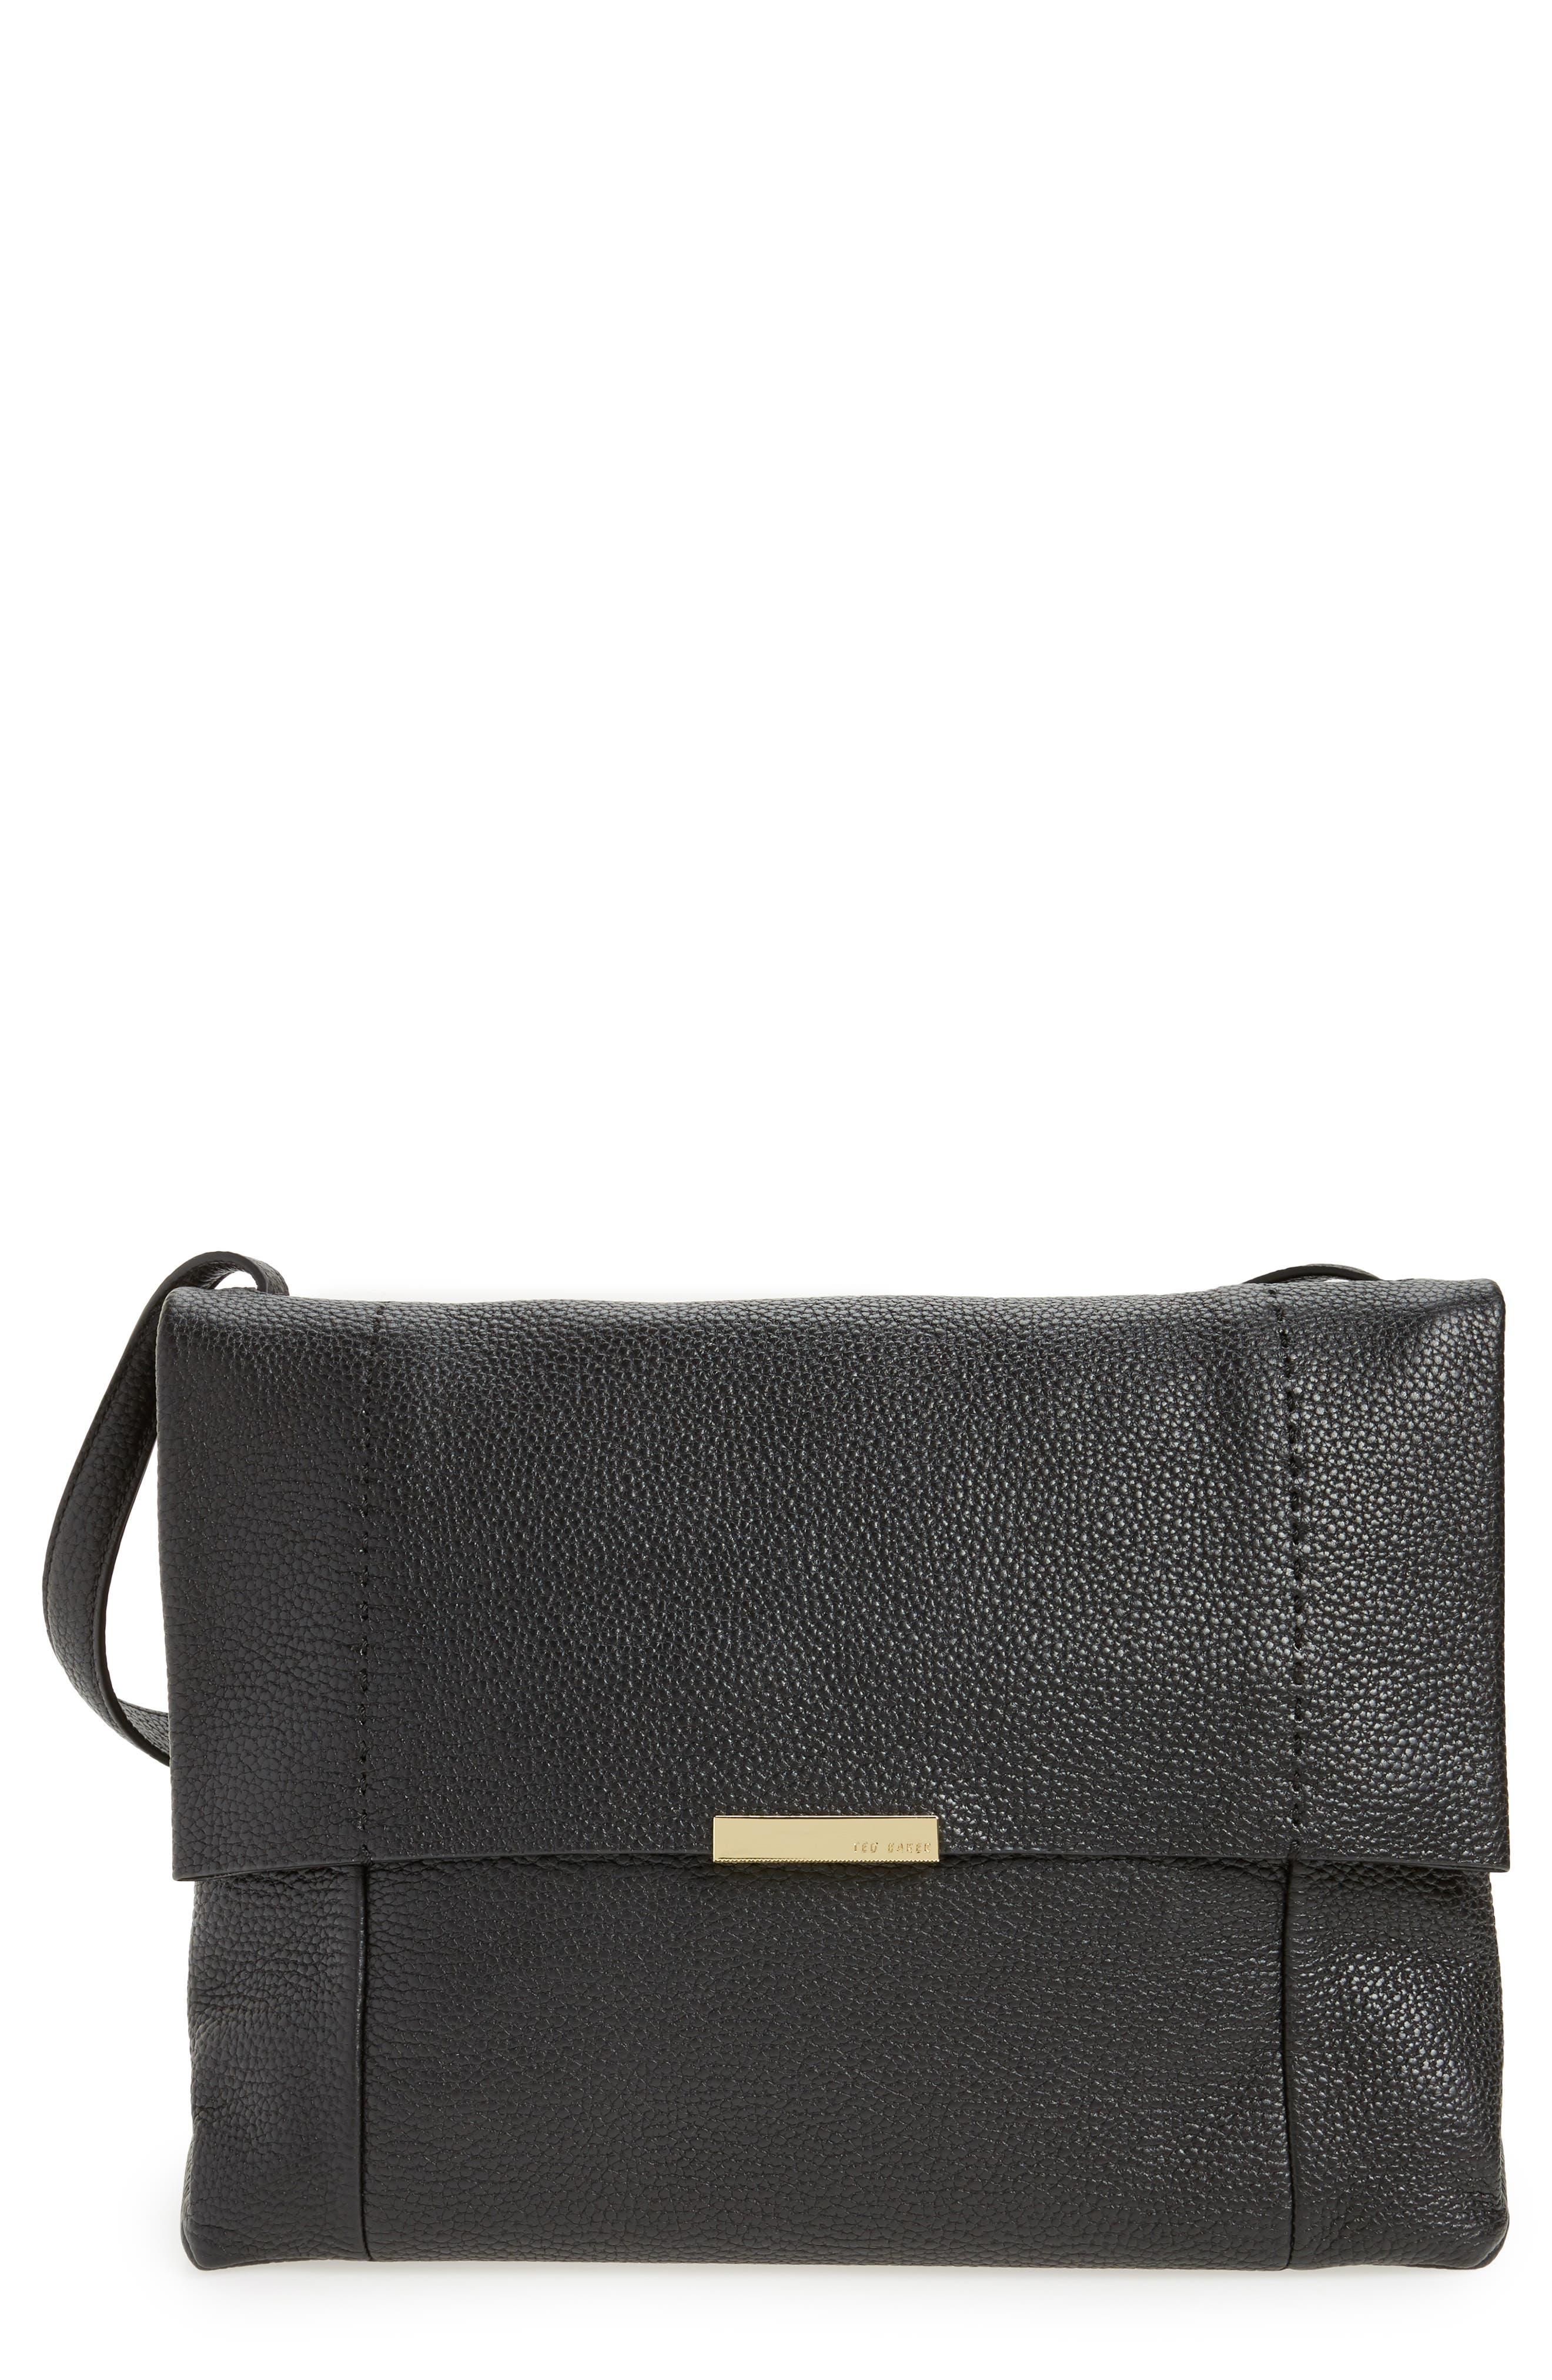 Proter Leather Shoulder Bag,                             Main thumbnail 1, color,                             001